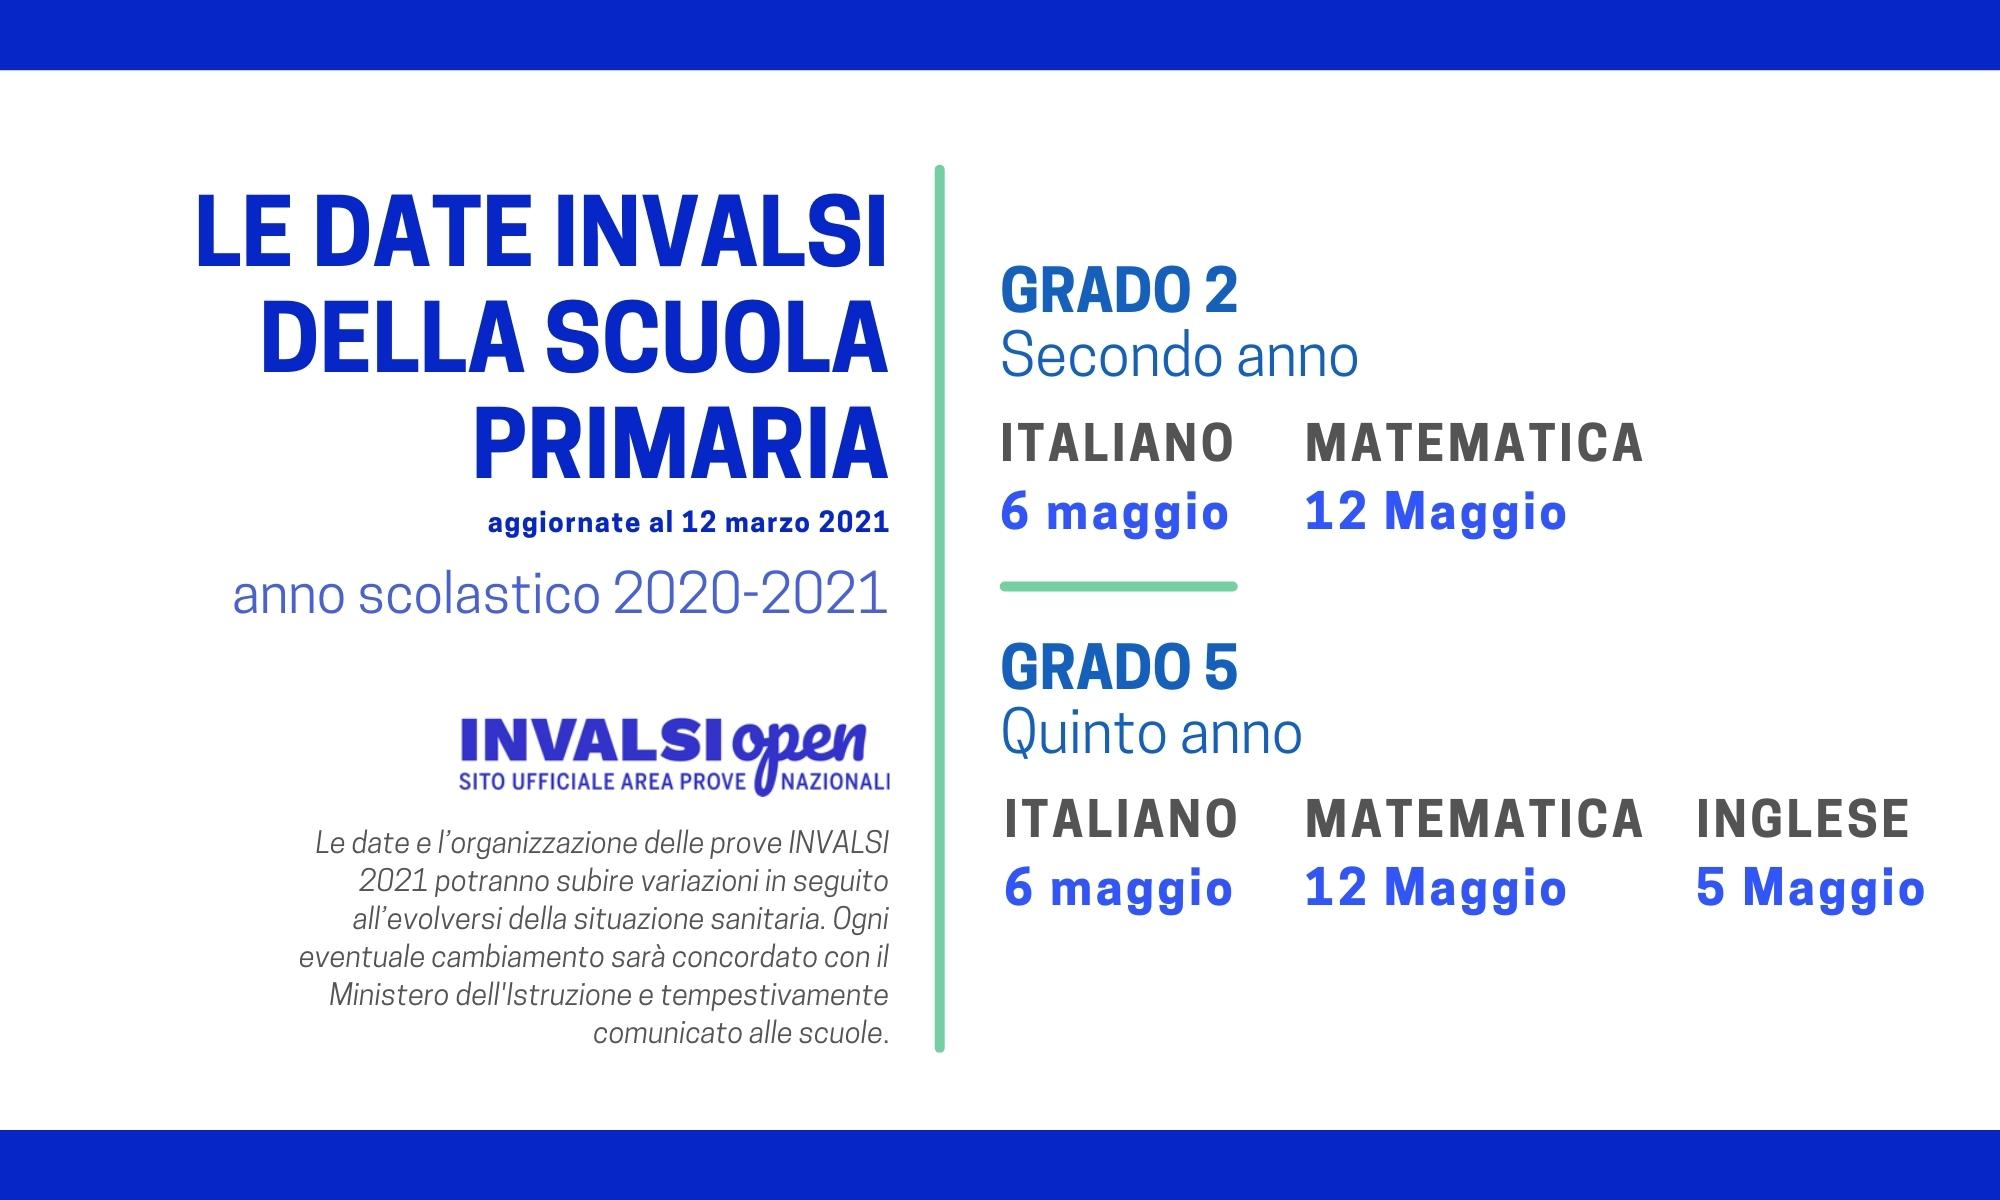 Calendario Prove INVALSI 2021 - Scuola primaria